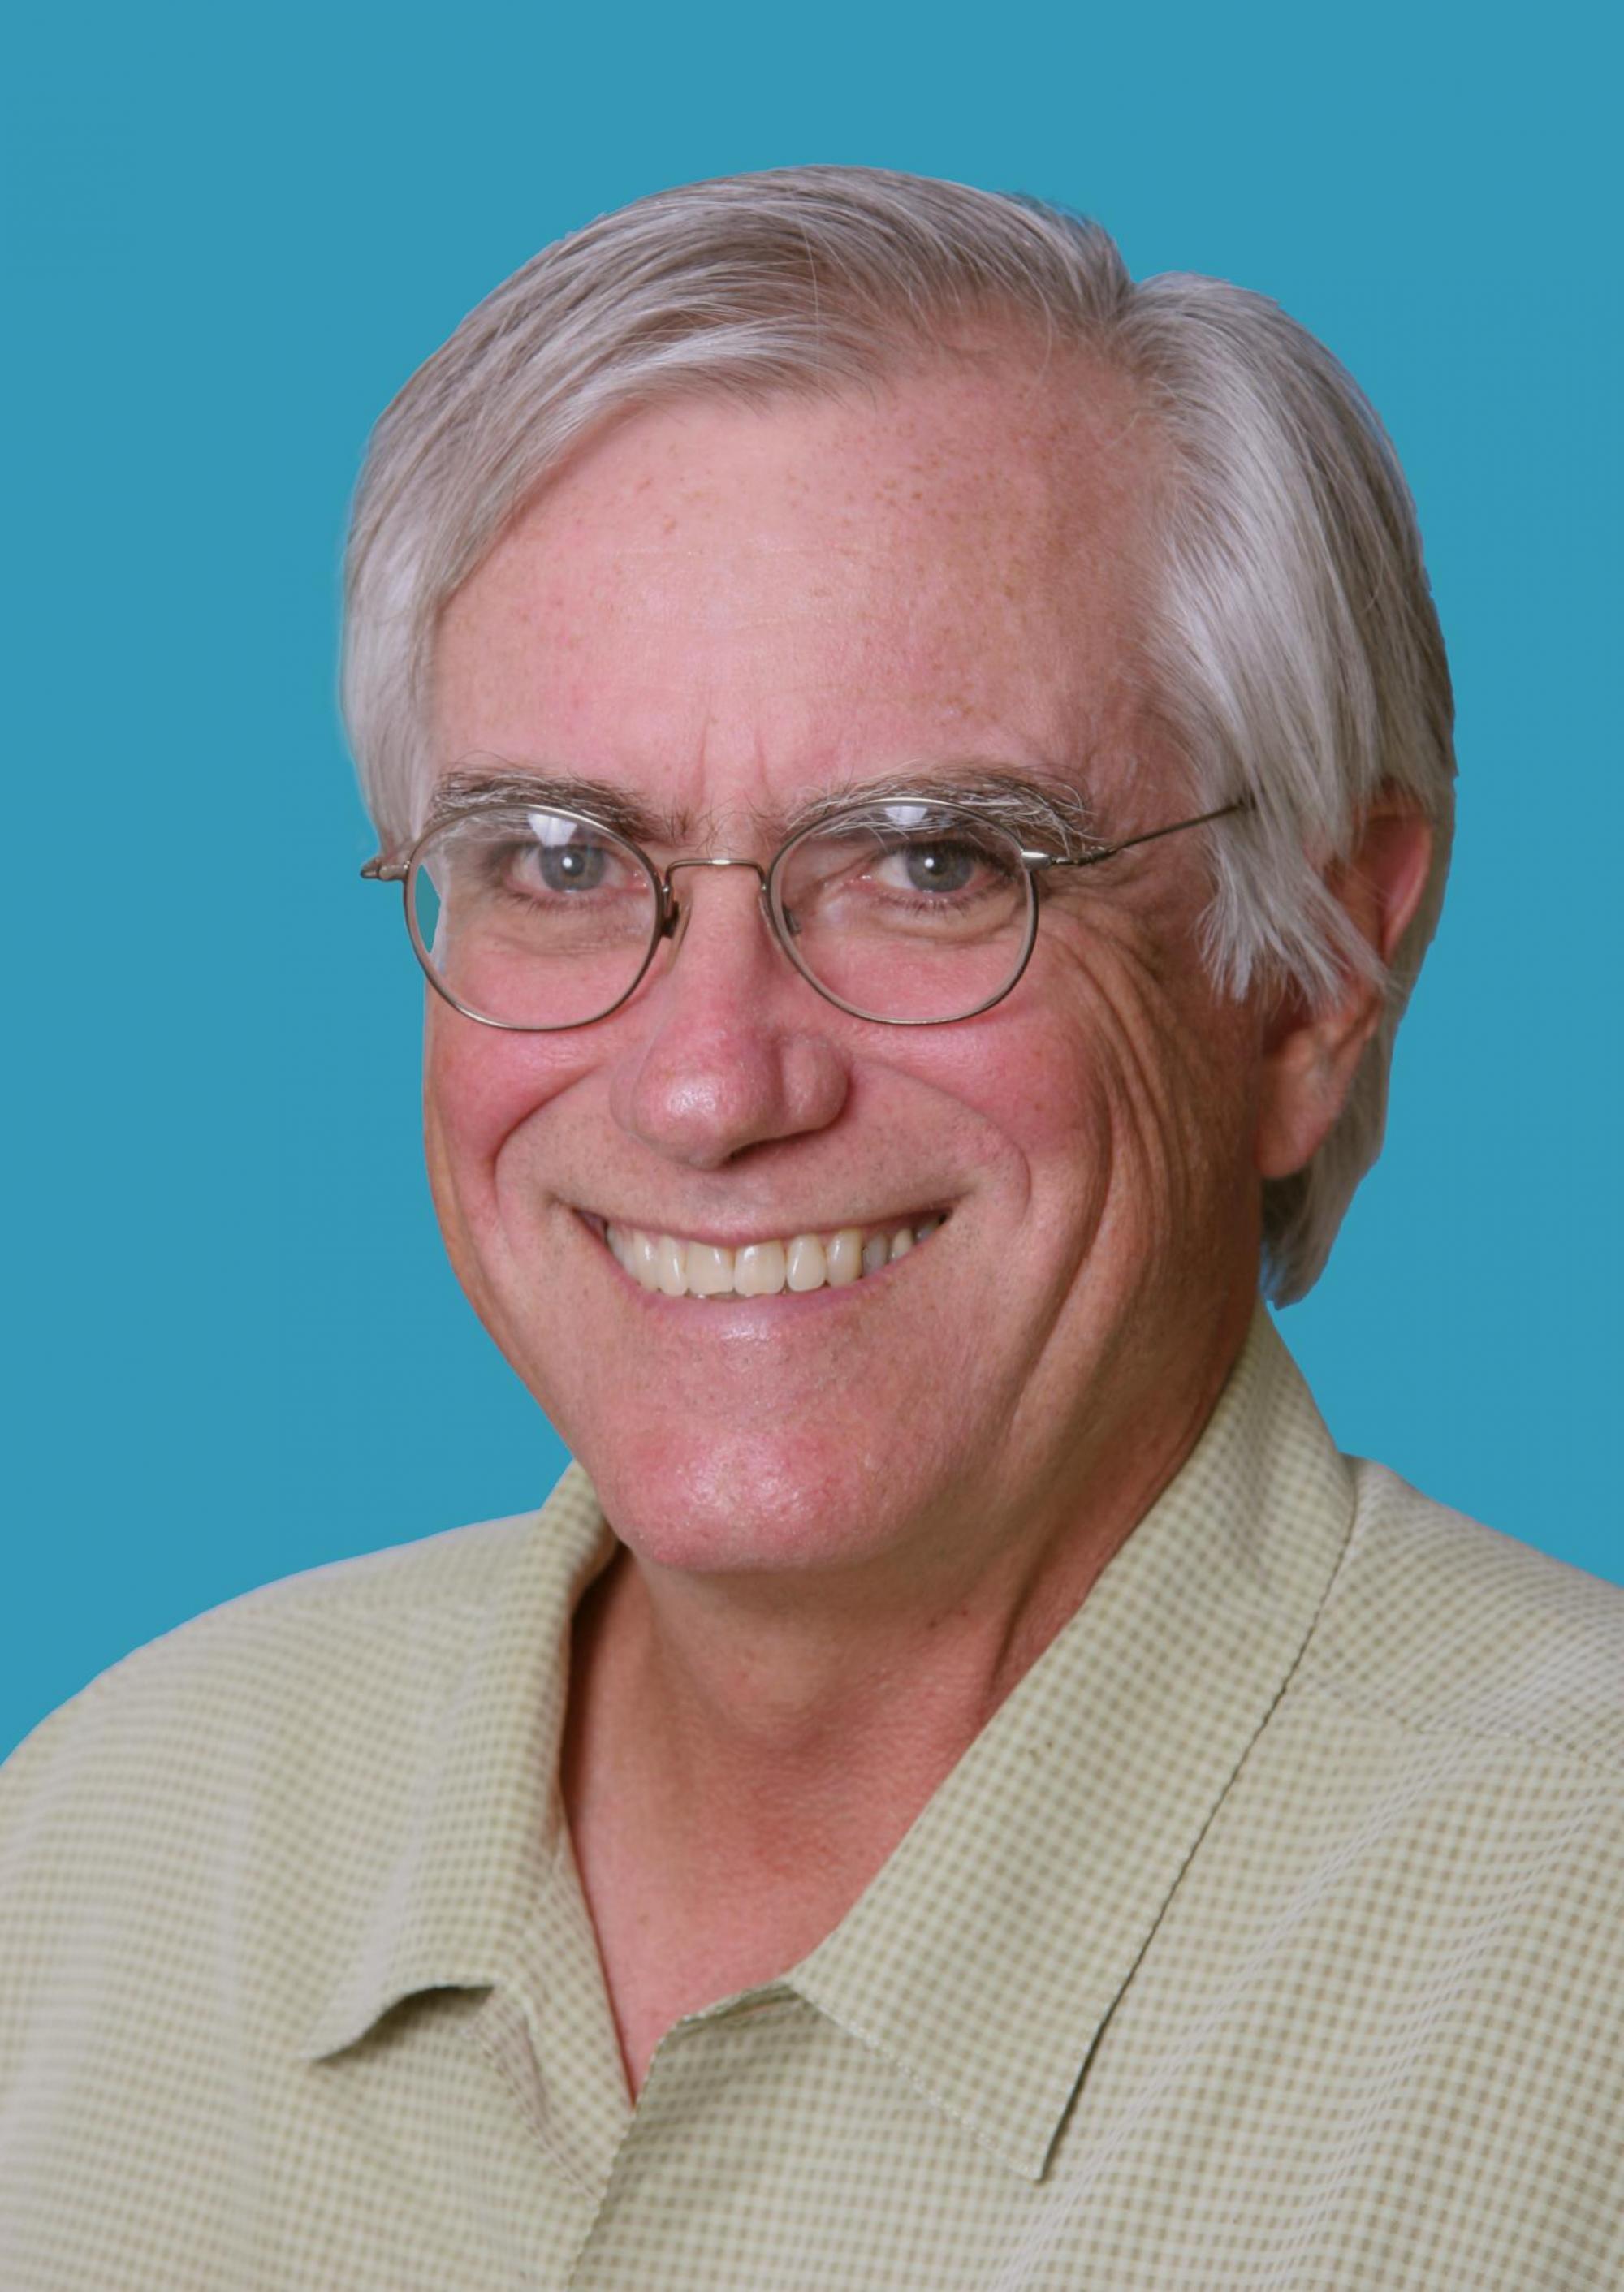 Peter Smith, Phoenix Mars Mission principal investigator